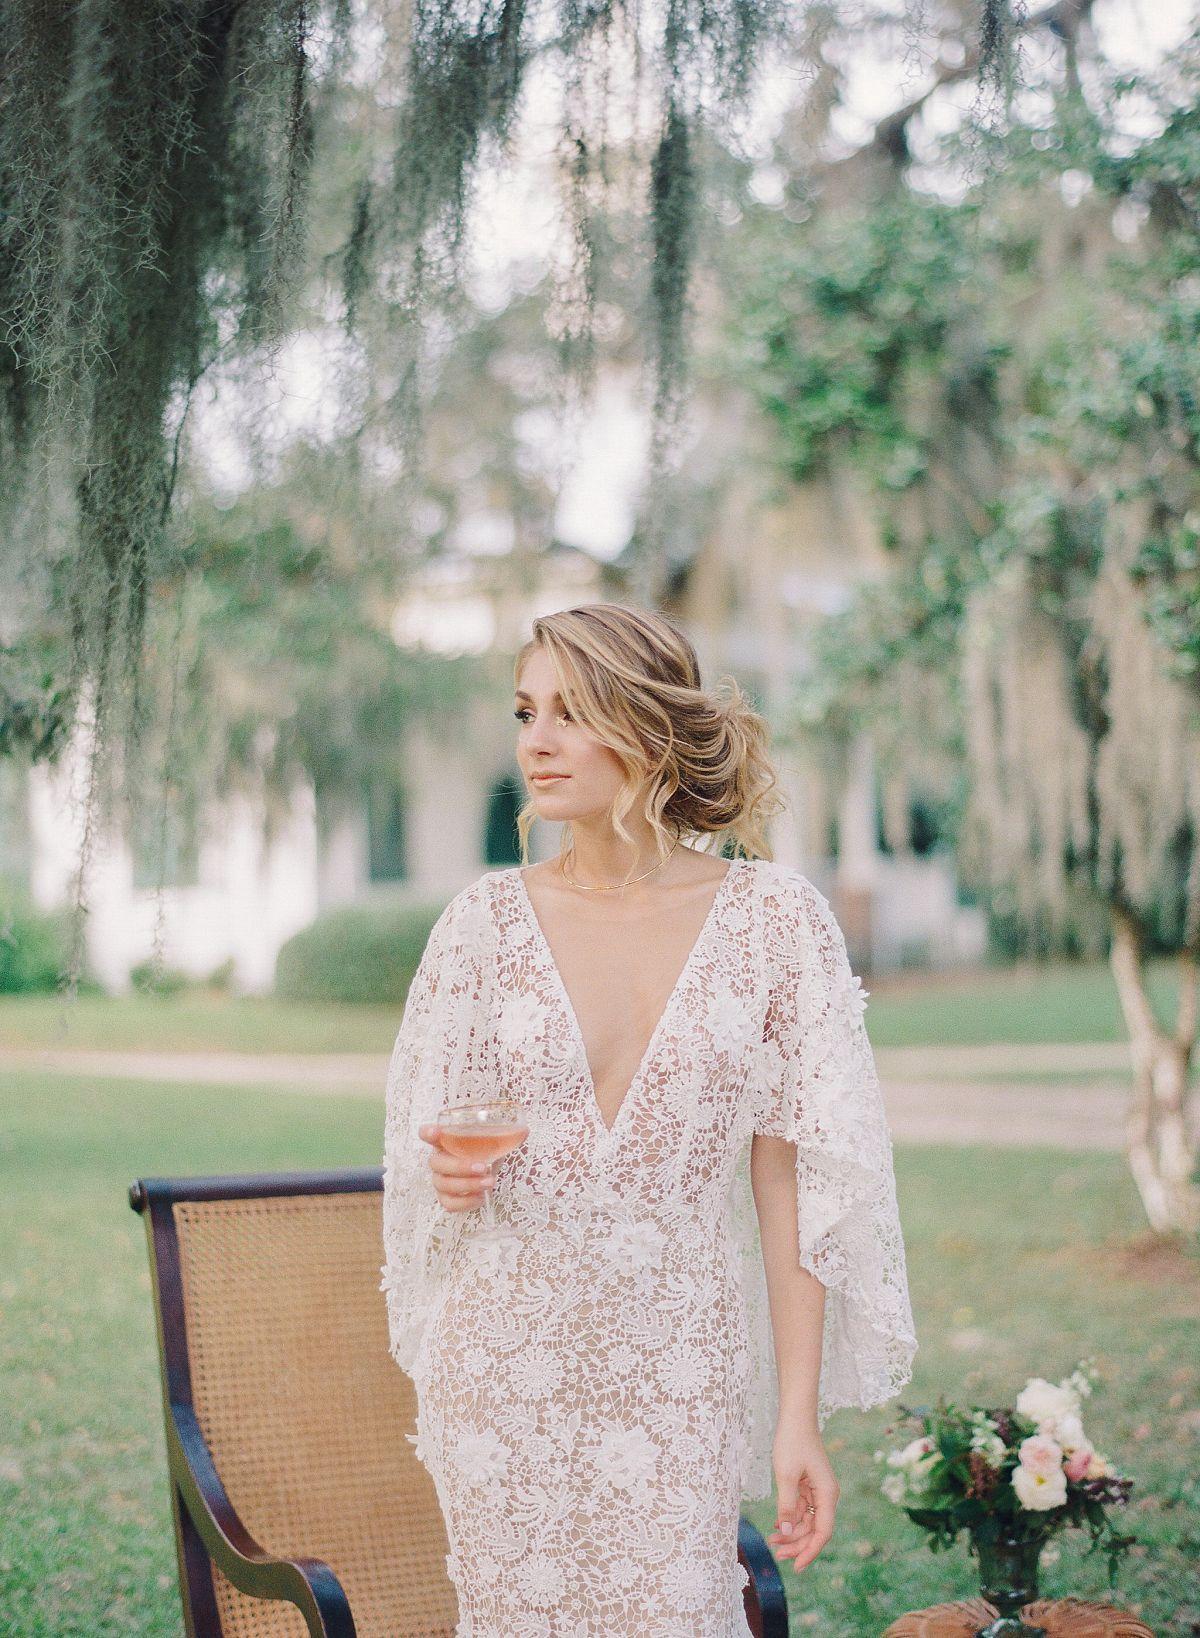 Heirloom Southern Belle Bridal Style Casamento boho